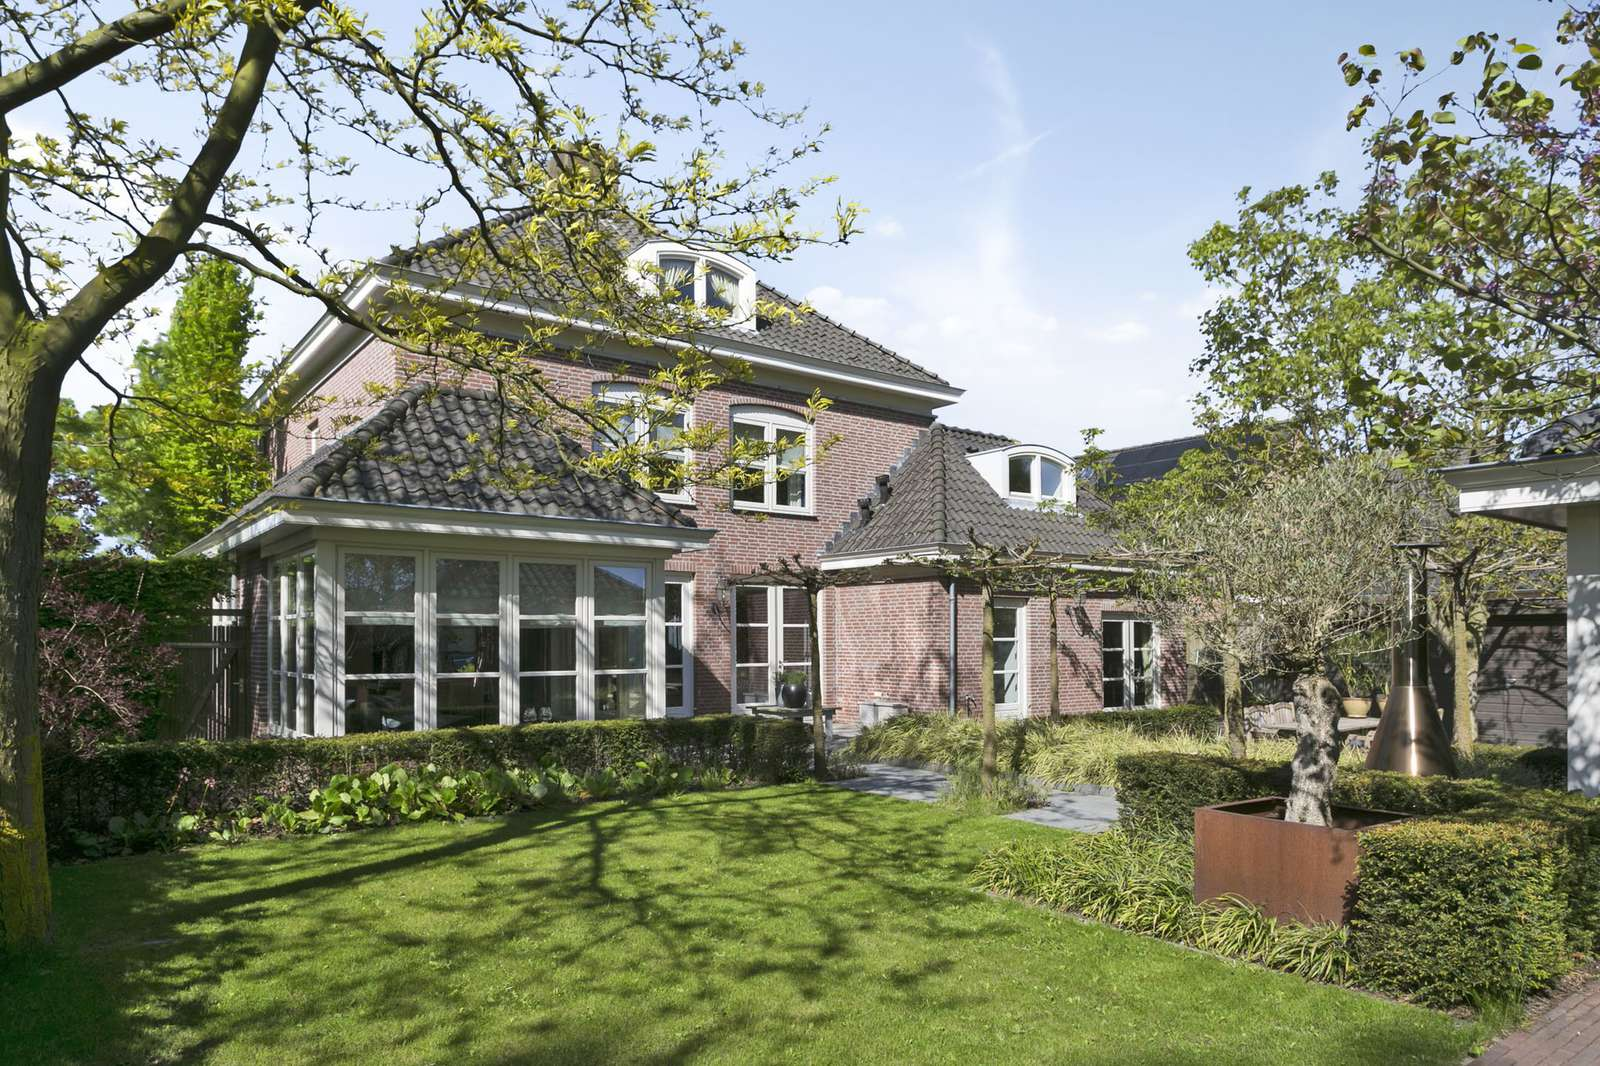 Tarweakker 60, villa 's-Hertogenbosch